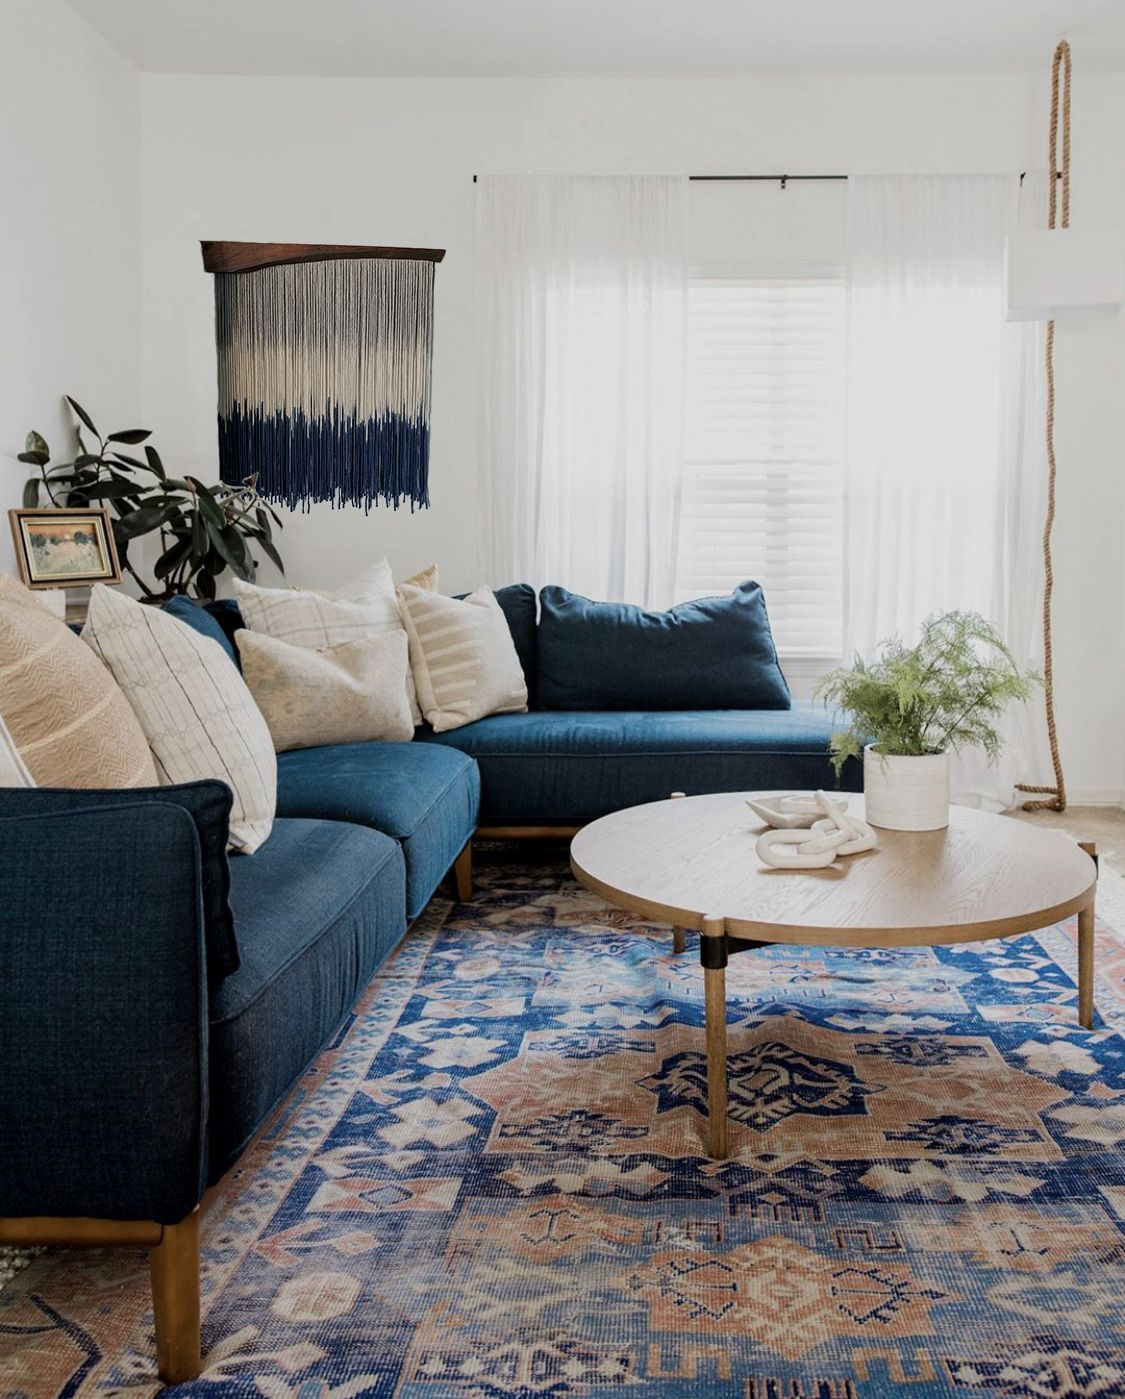 Ocean Modern Macrame Yarn Wall Hanging Fiber Art Bold Art Blue Sofas Living Room Blue Couch Living Grey Couch Living Room